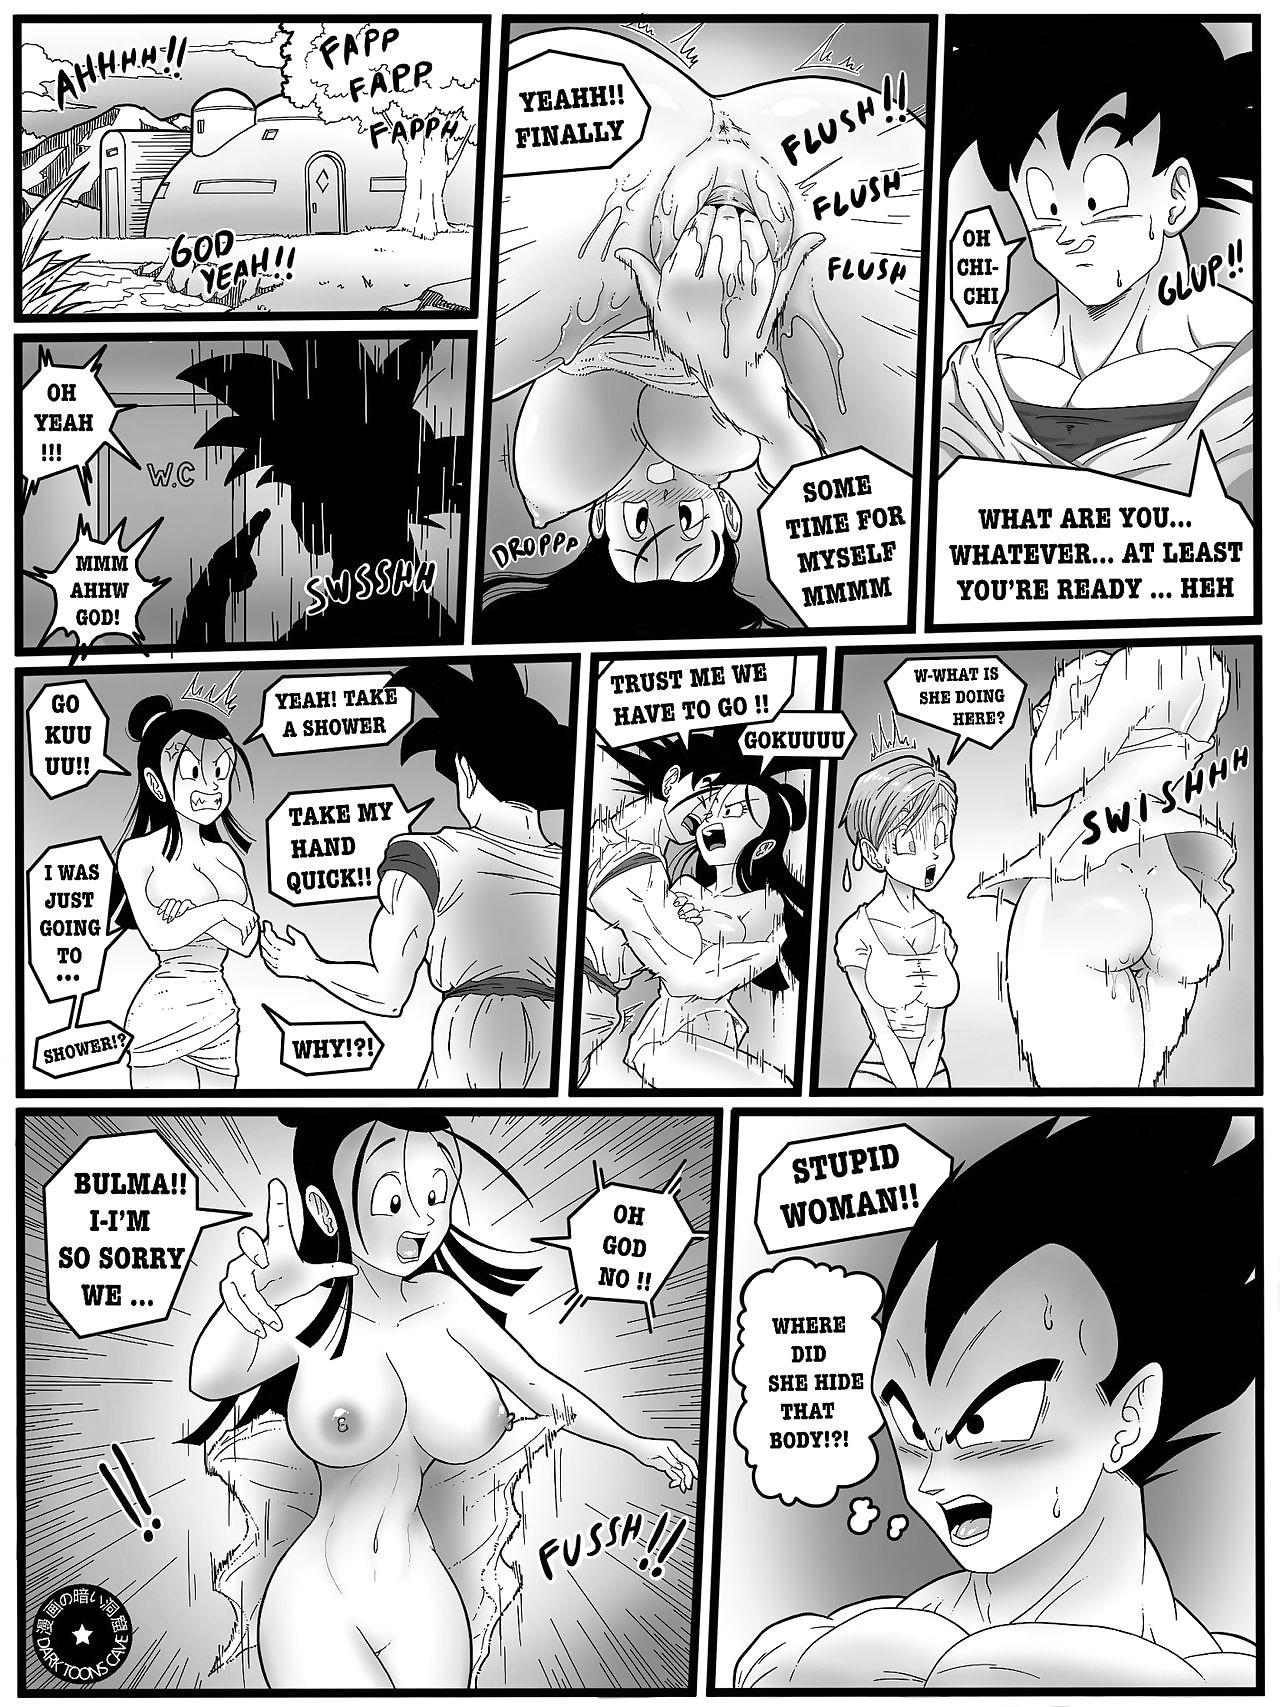 Saiyan's Wives Priorities